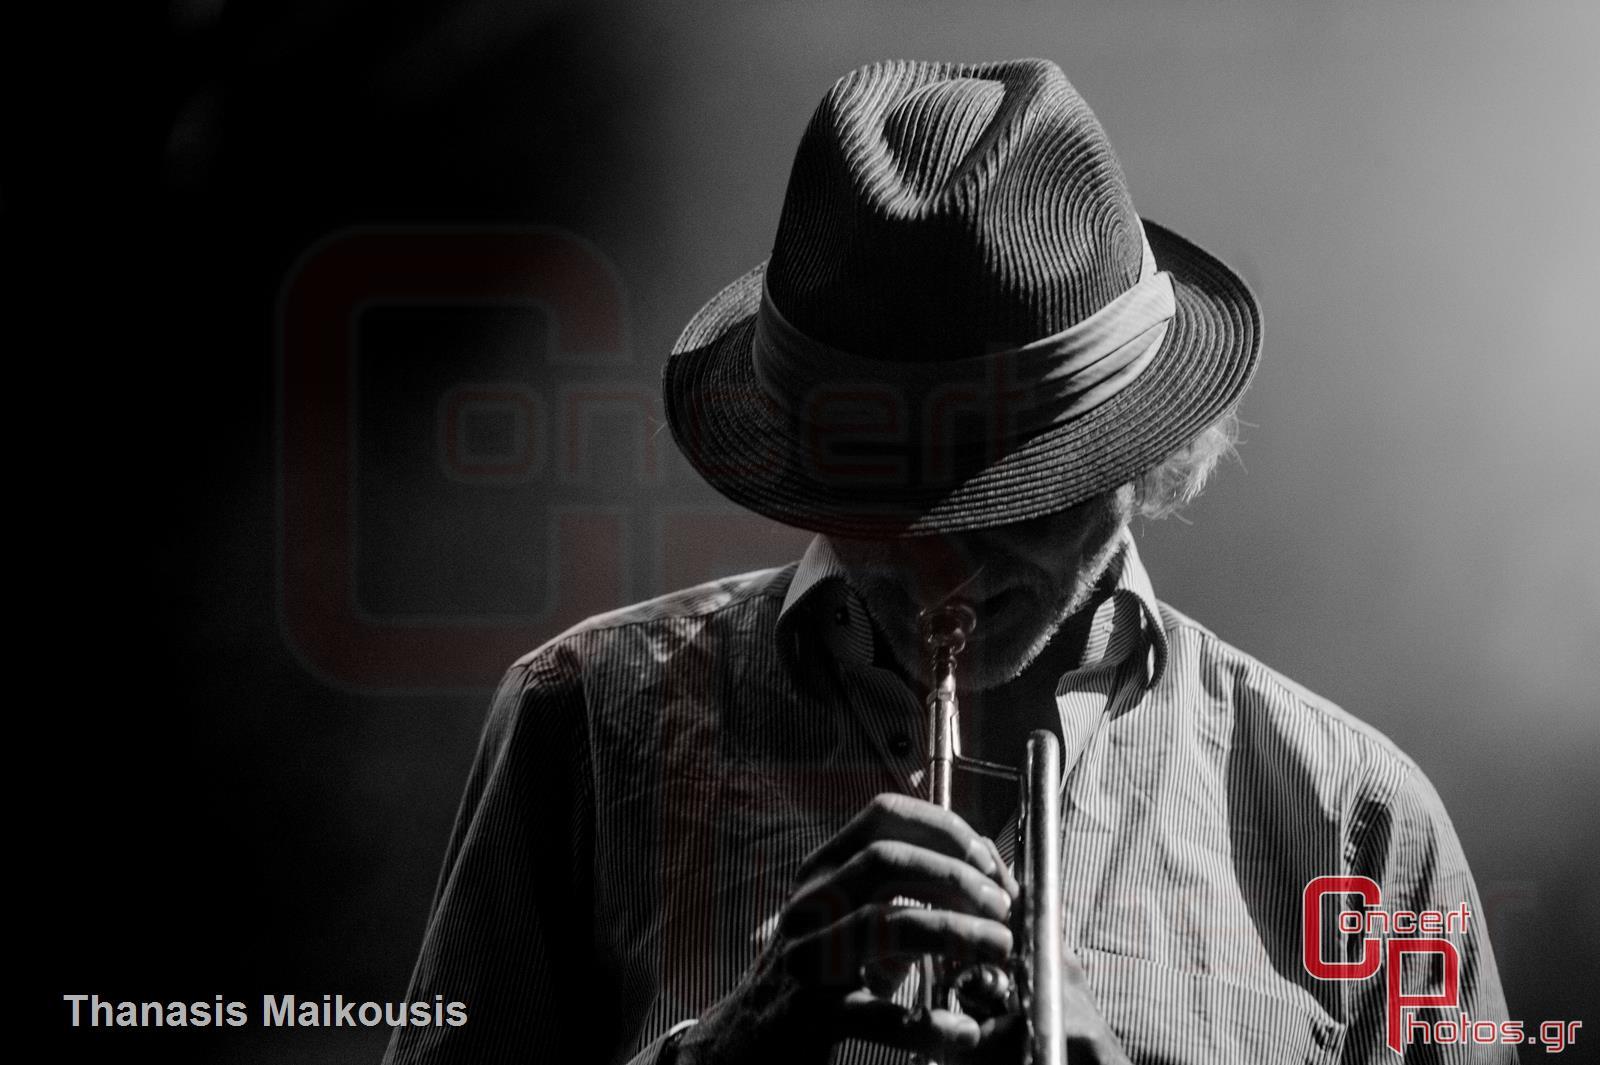 Active Member - Τραγούδα μας να φύγει το σκοτάδι- photographer: Thanasis Maikousis - concertphotos_-5475